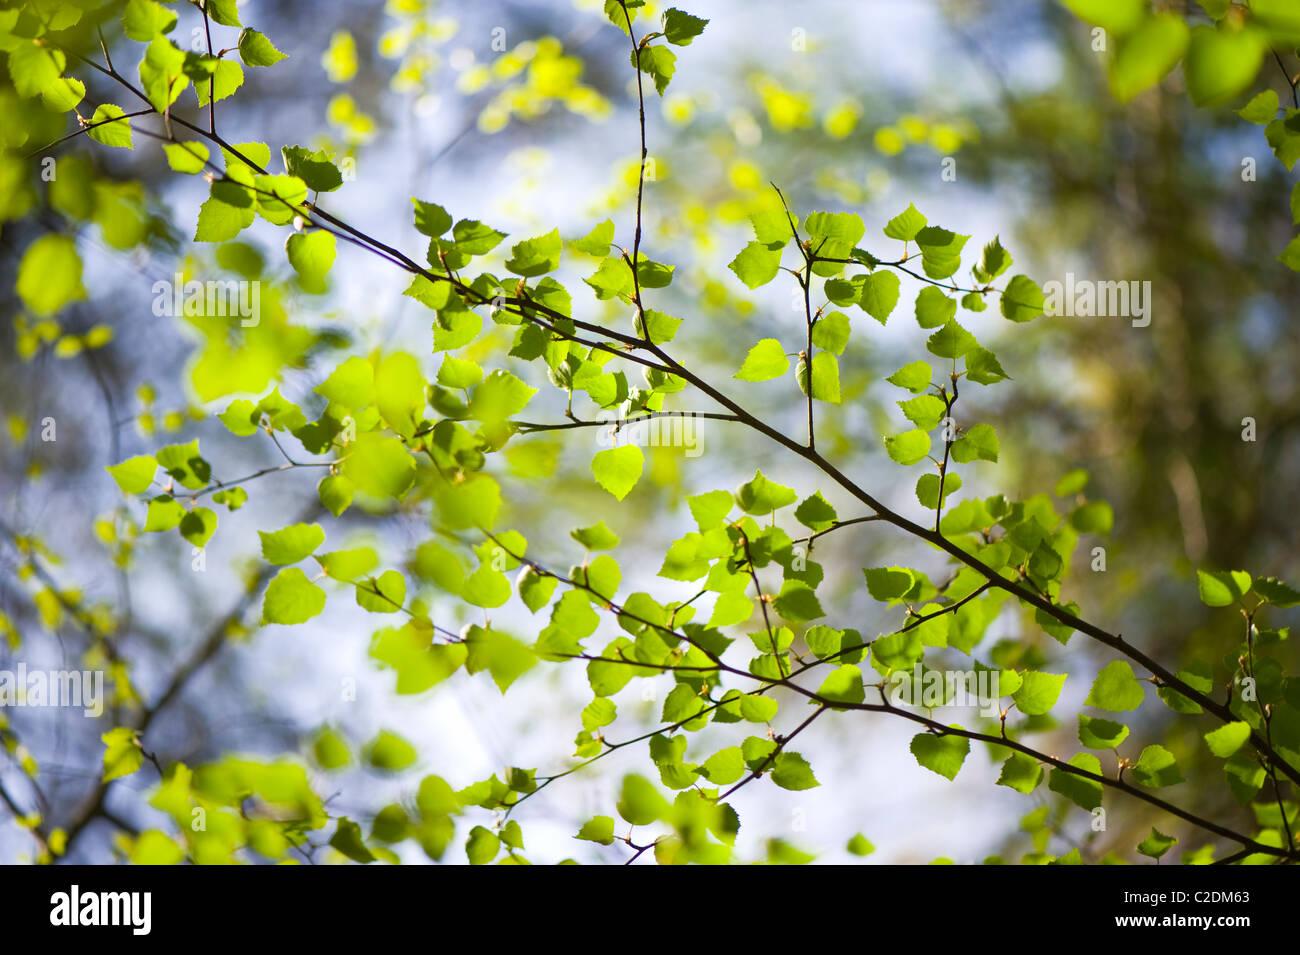 European Beech Tree Stock Photos & European Beech Tree Stock Images ...